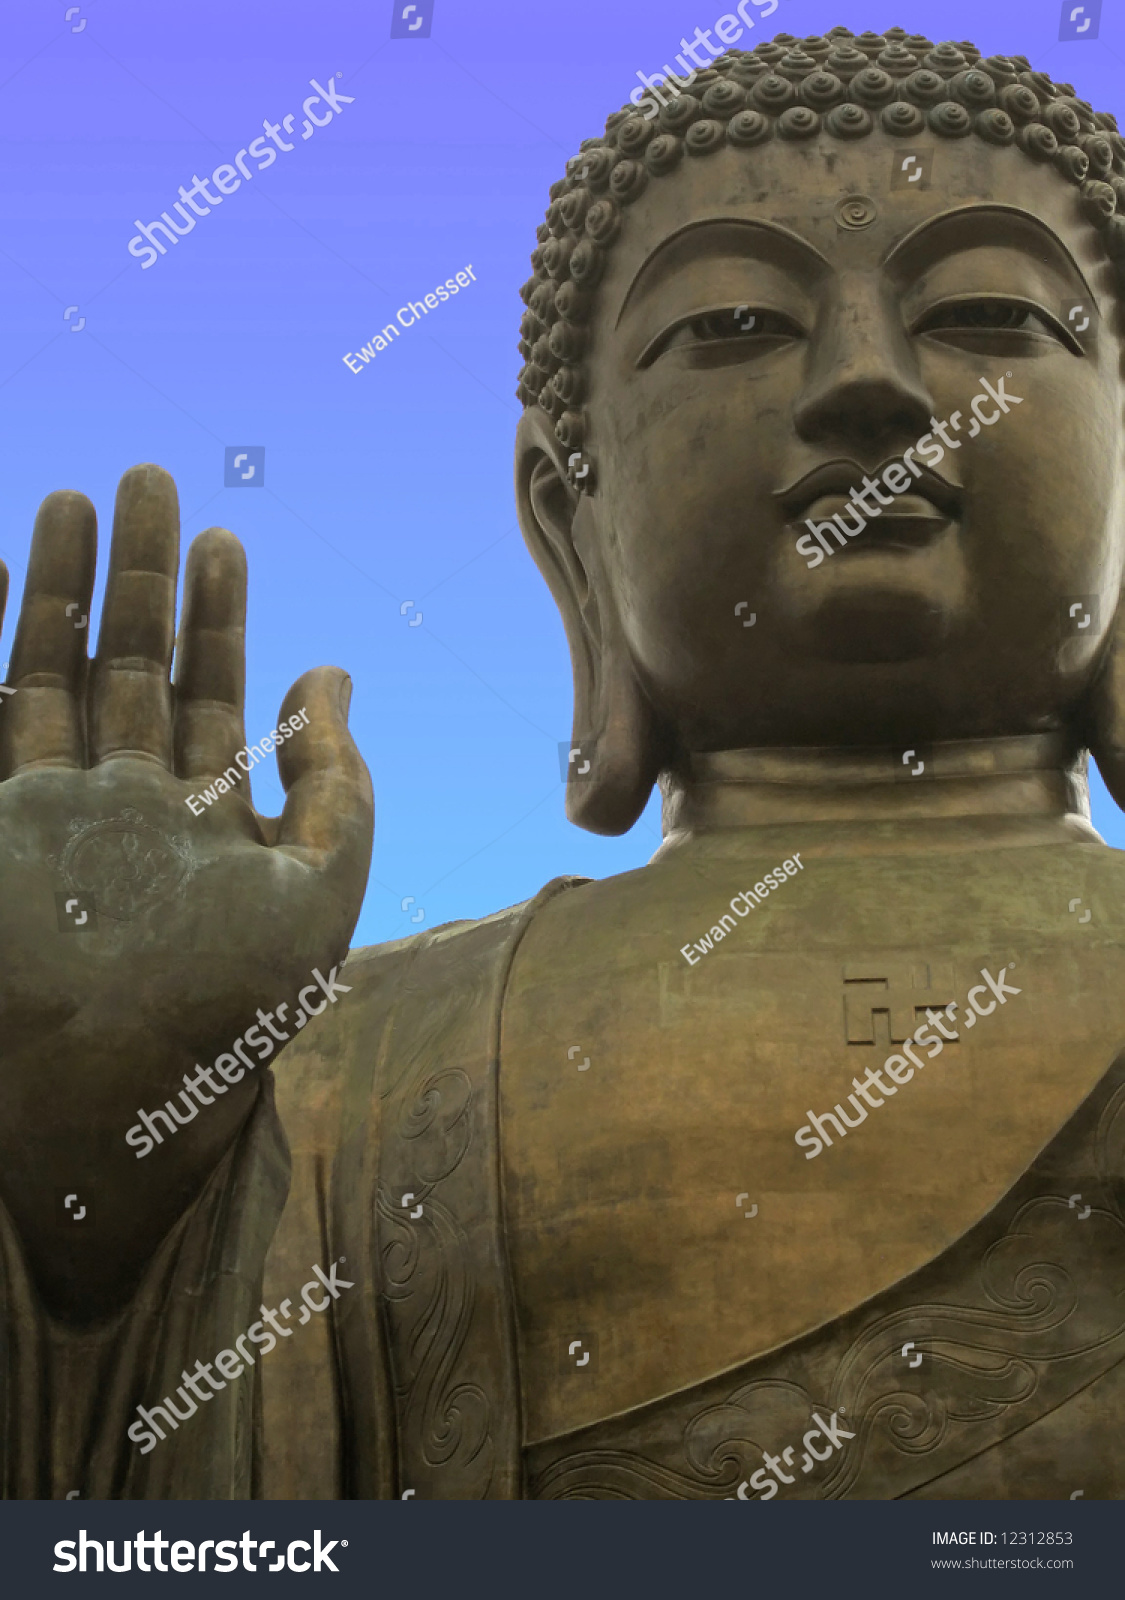 how to go to giant buddha hong kong